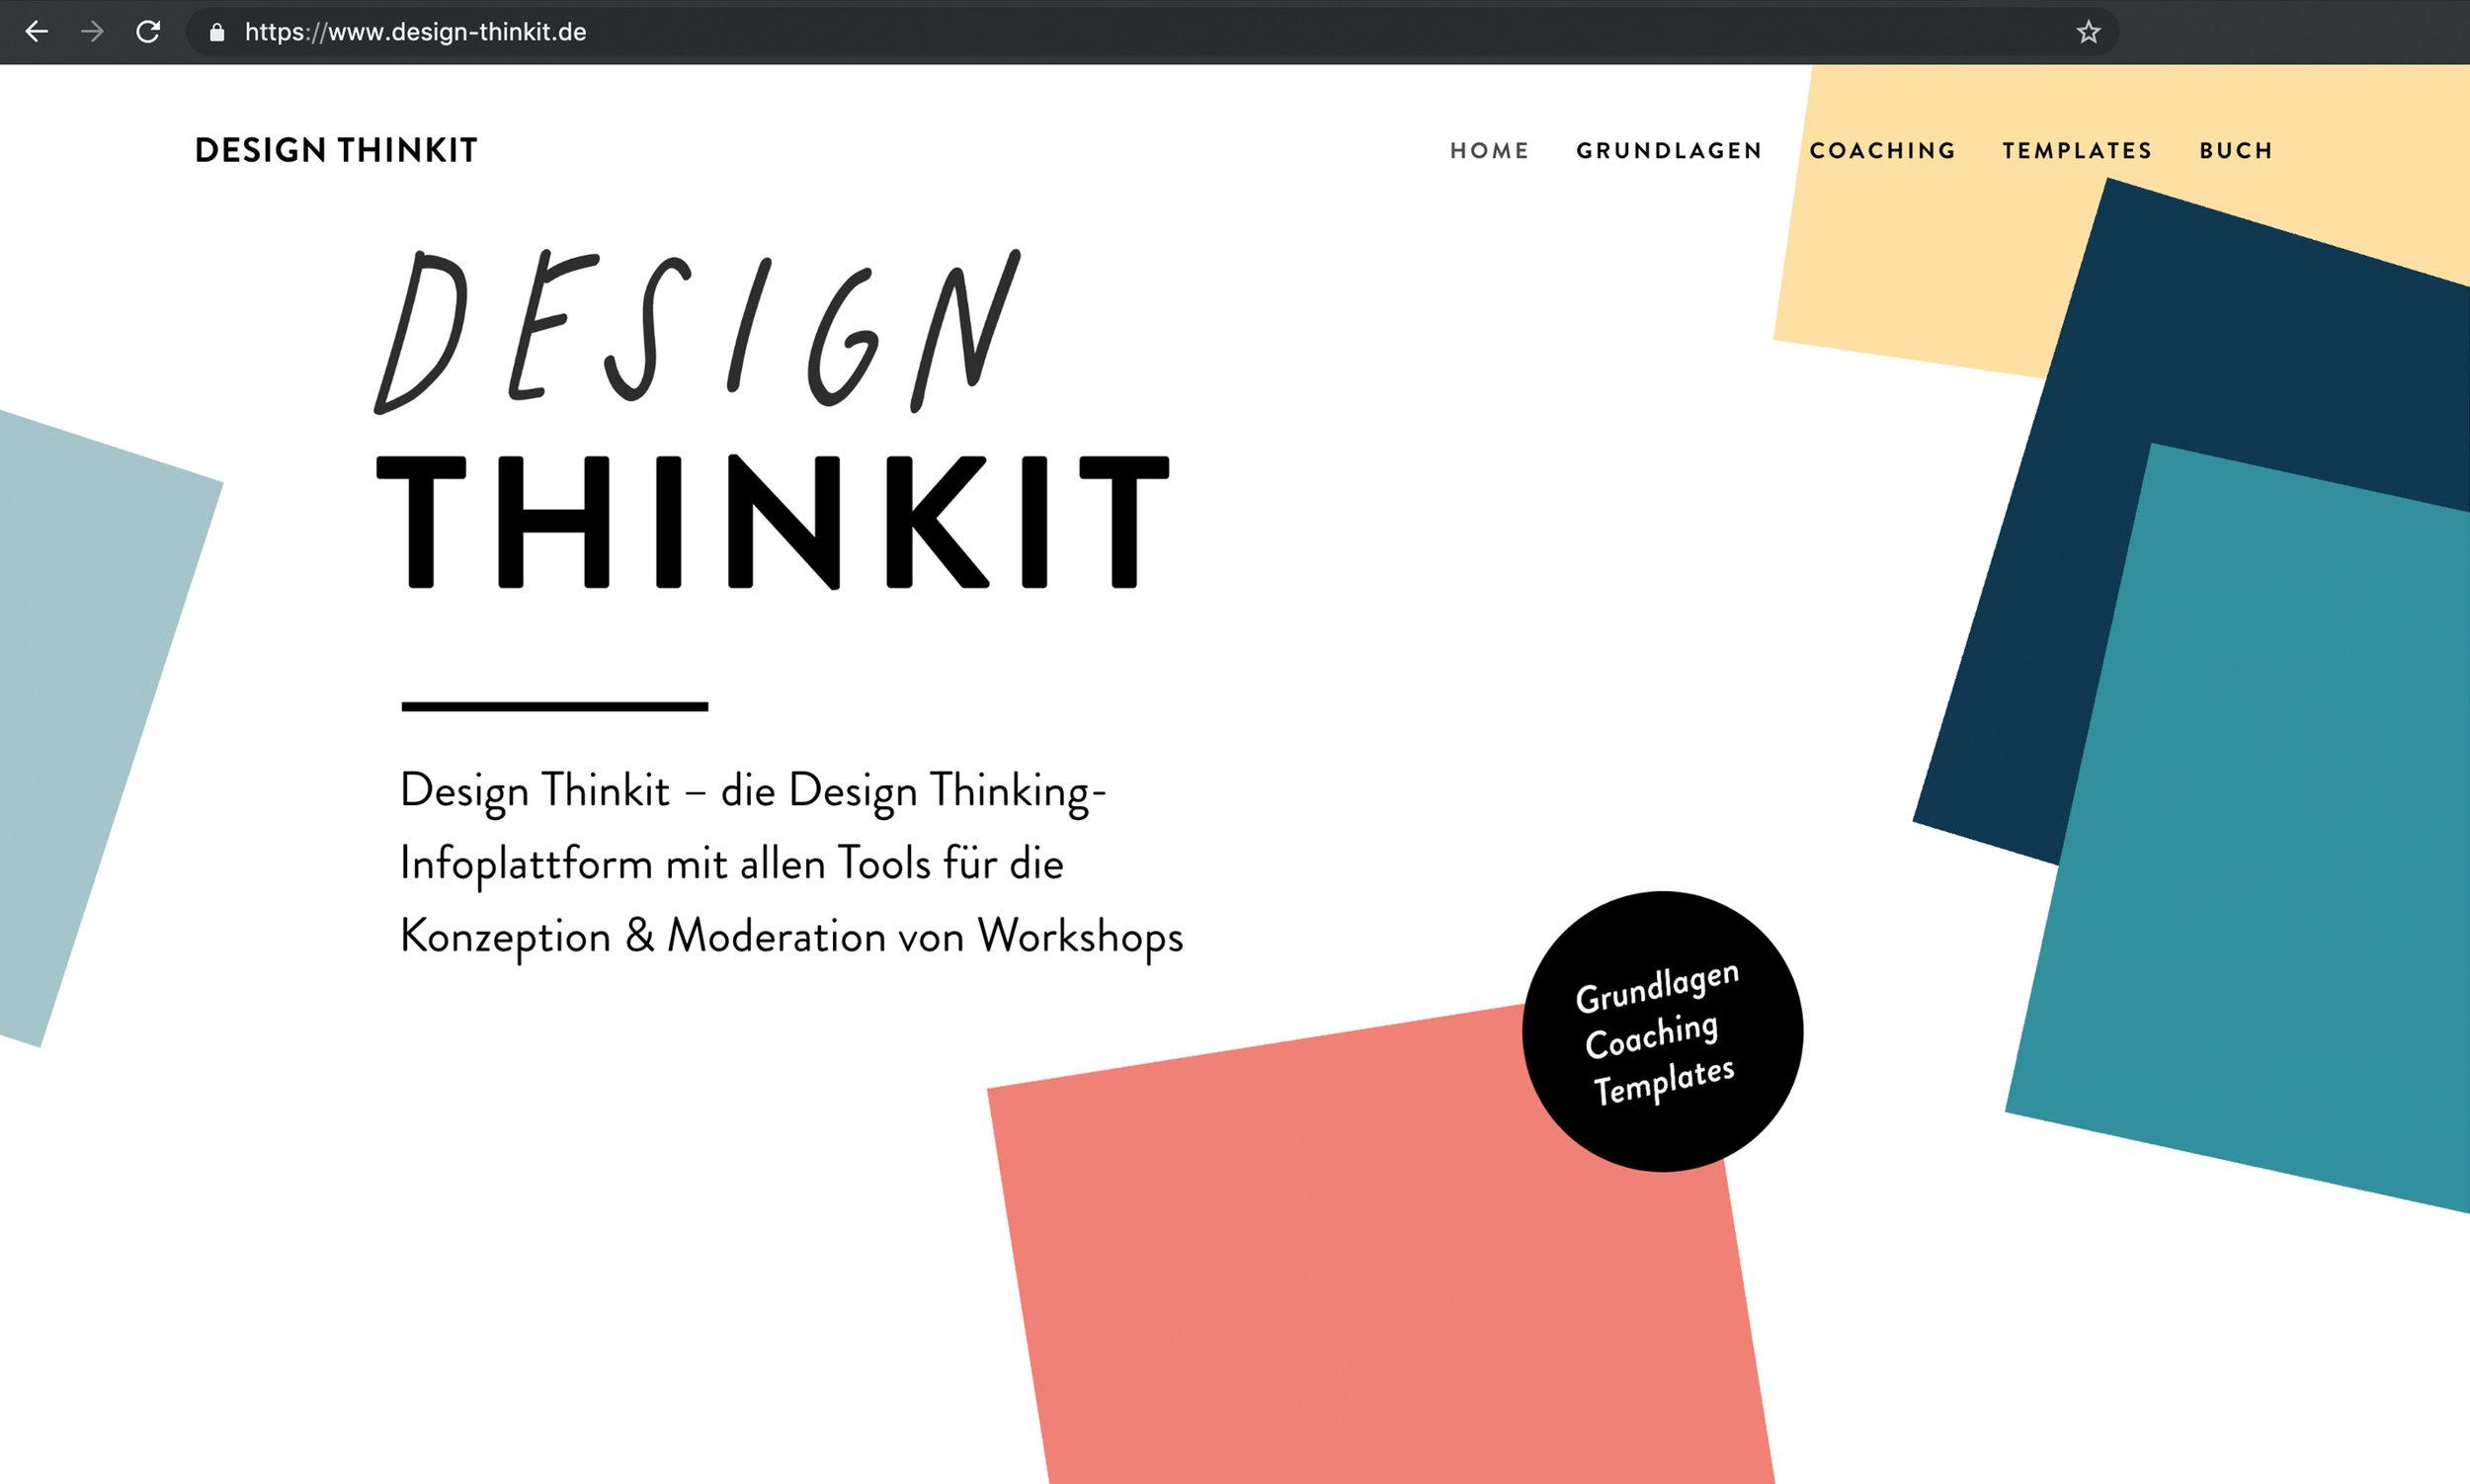 design-thinkit-website-home-screenshot.jpg